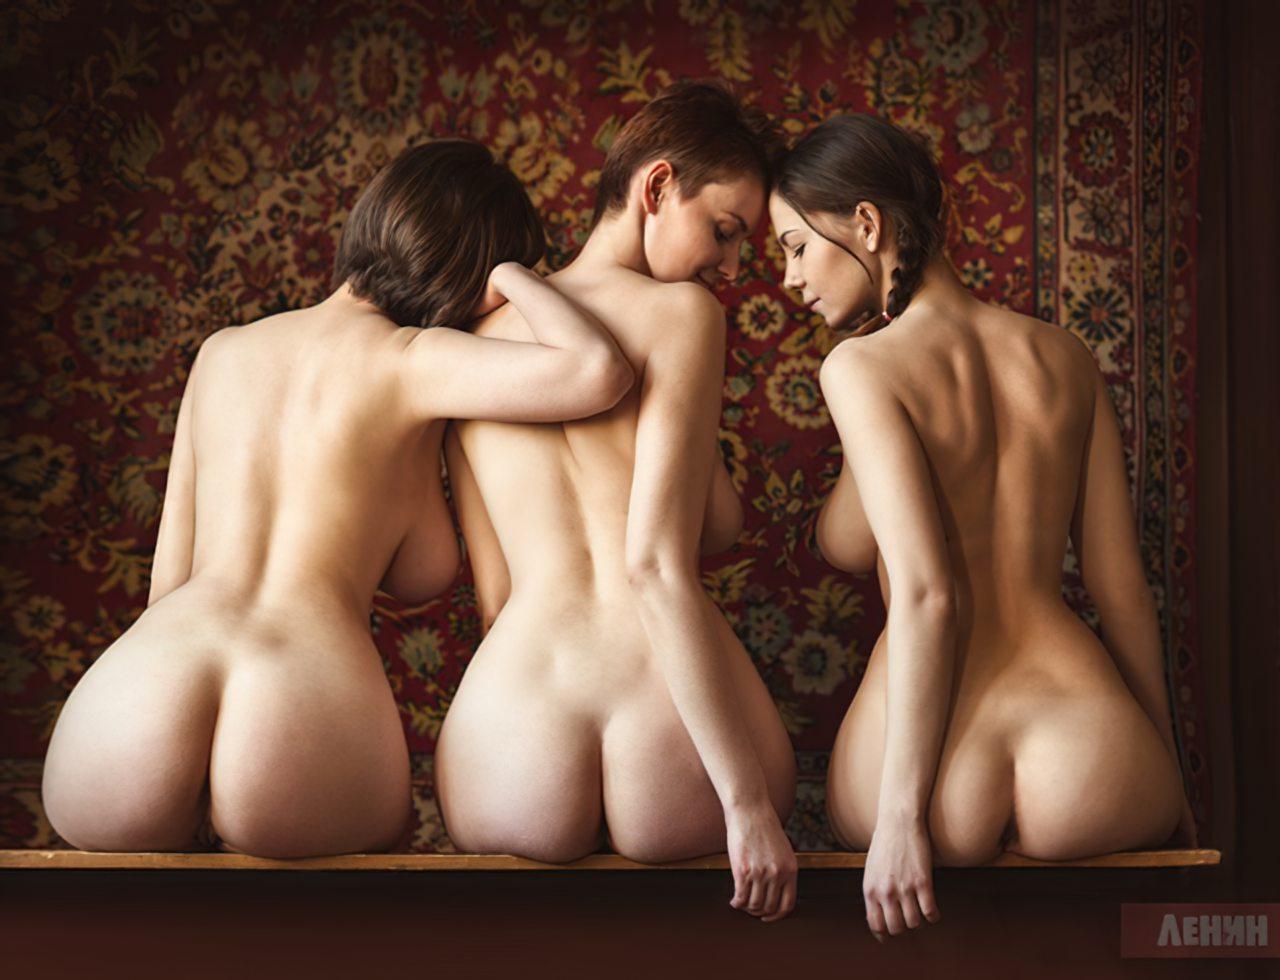 Fotos de Mulheres Nuas (9)